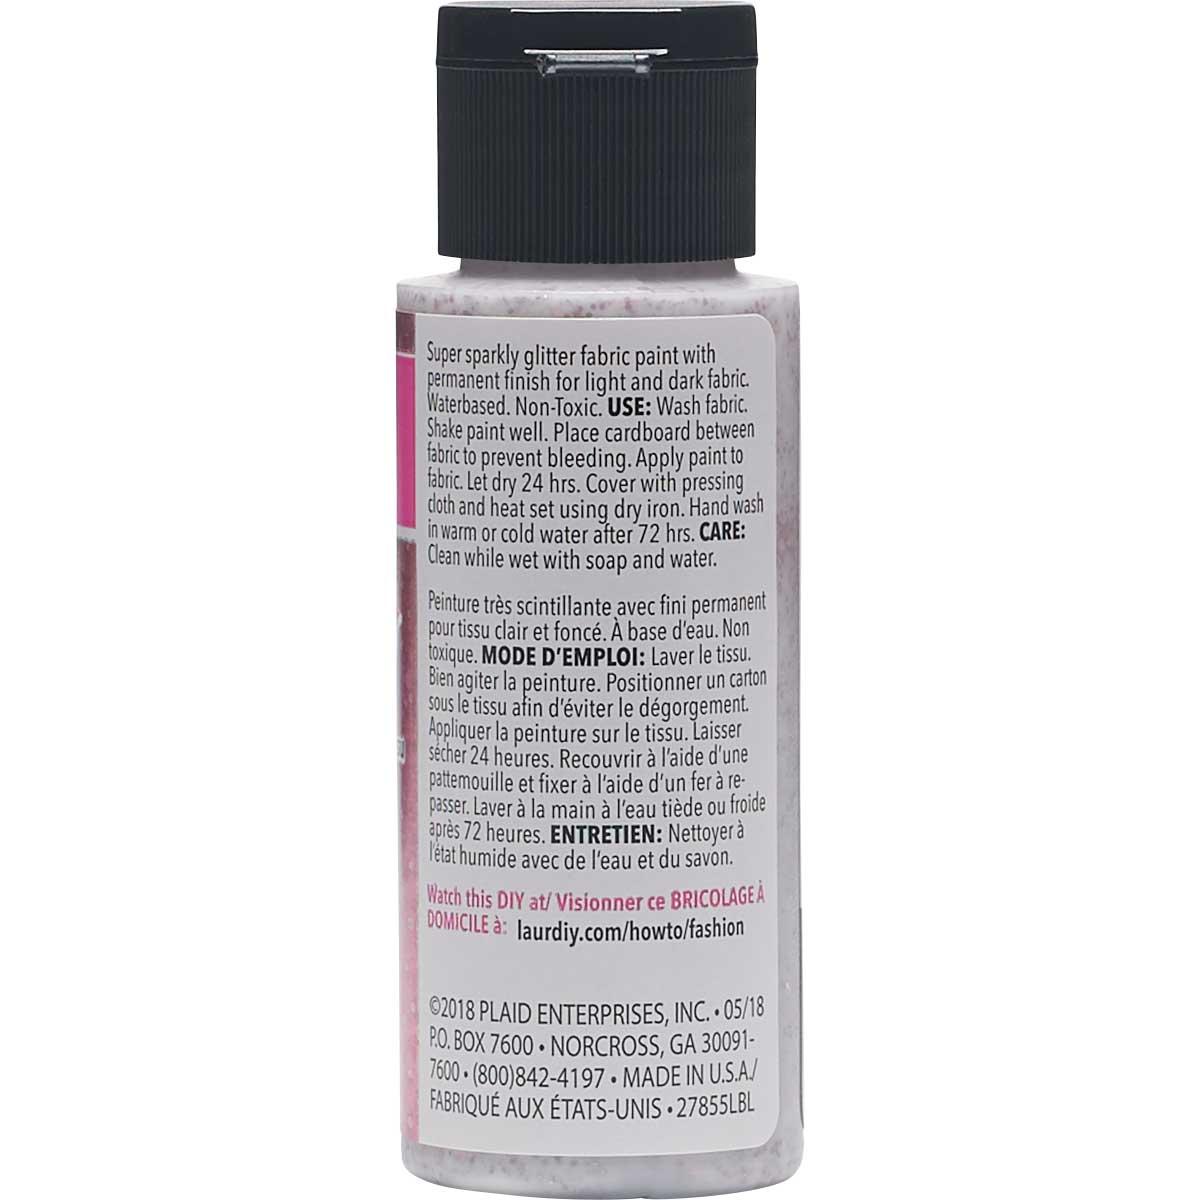 LaurDIY ® Galaxy Glitter Fabric Paint - Nebula, 2 oz.